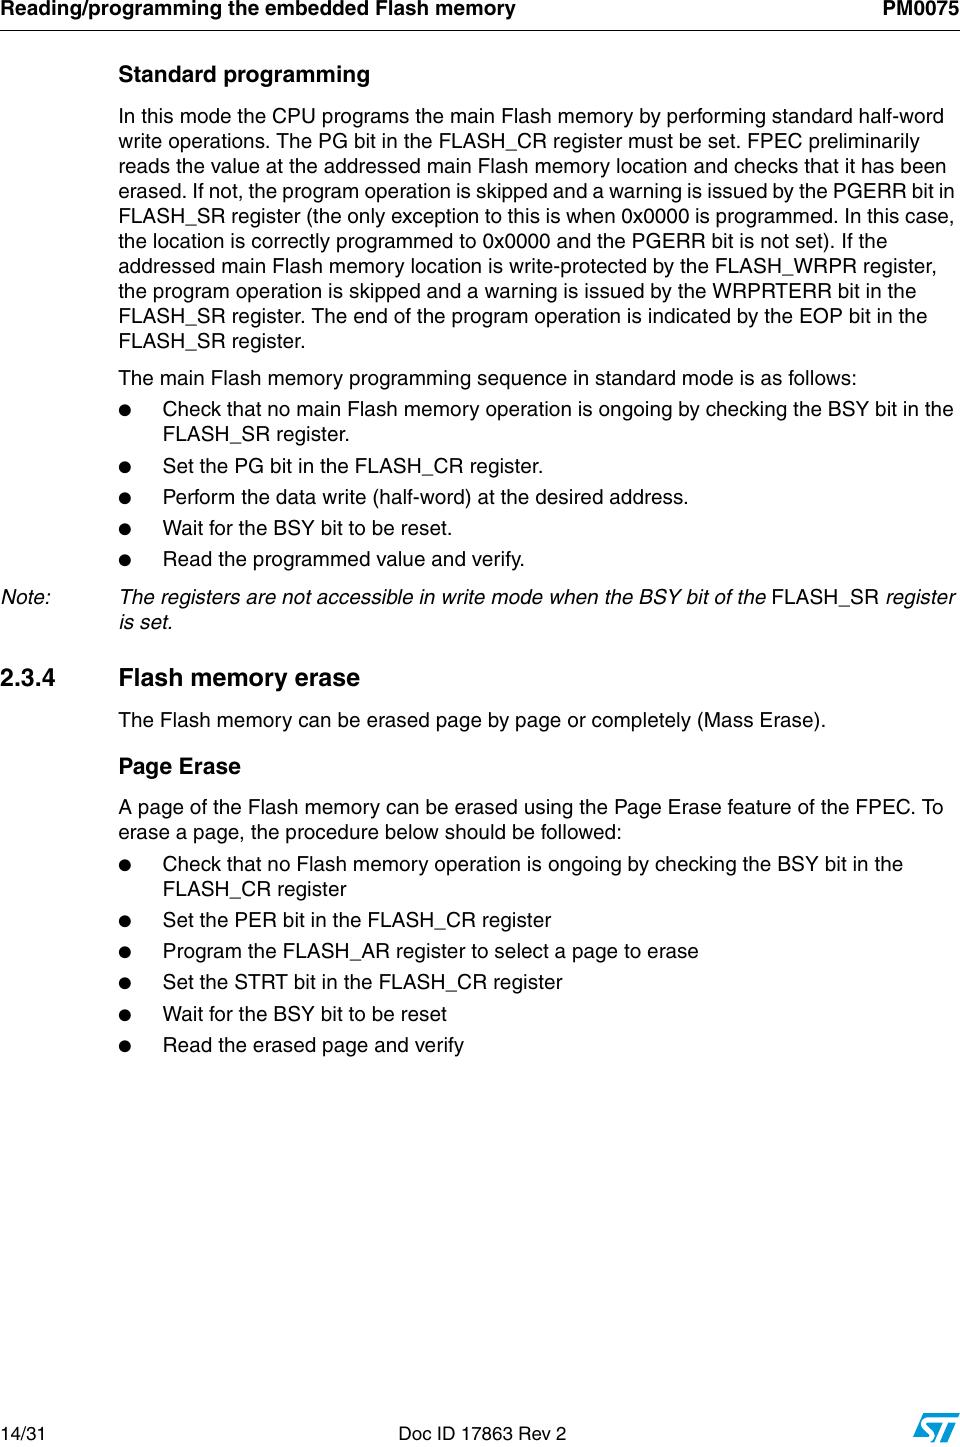 STM32F10xxx Flash Memory Microcontrollers Stm32f1 PM0075 Programming